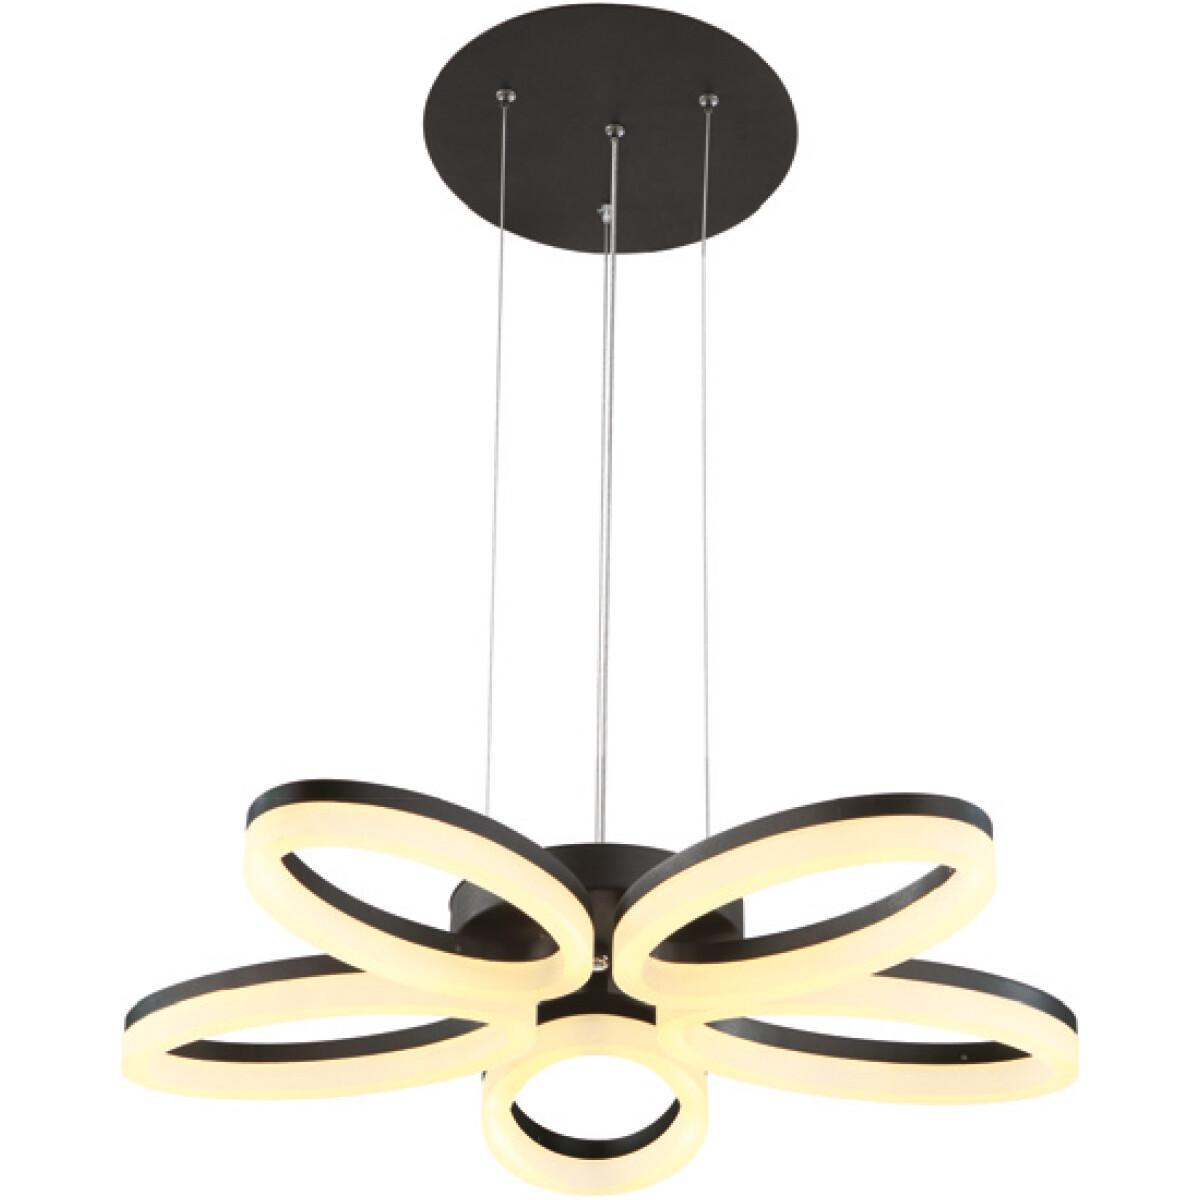 LED Plafondlamp - Plafondverlichting - Luxury - 40W - Natuurlijk Wit 4000K - Zwart Aluminium